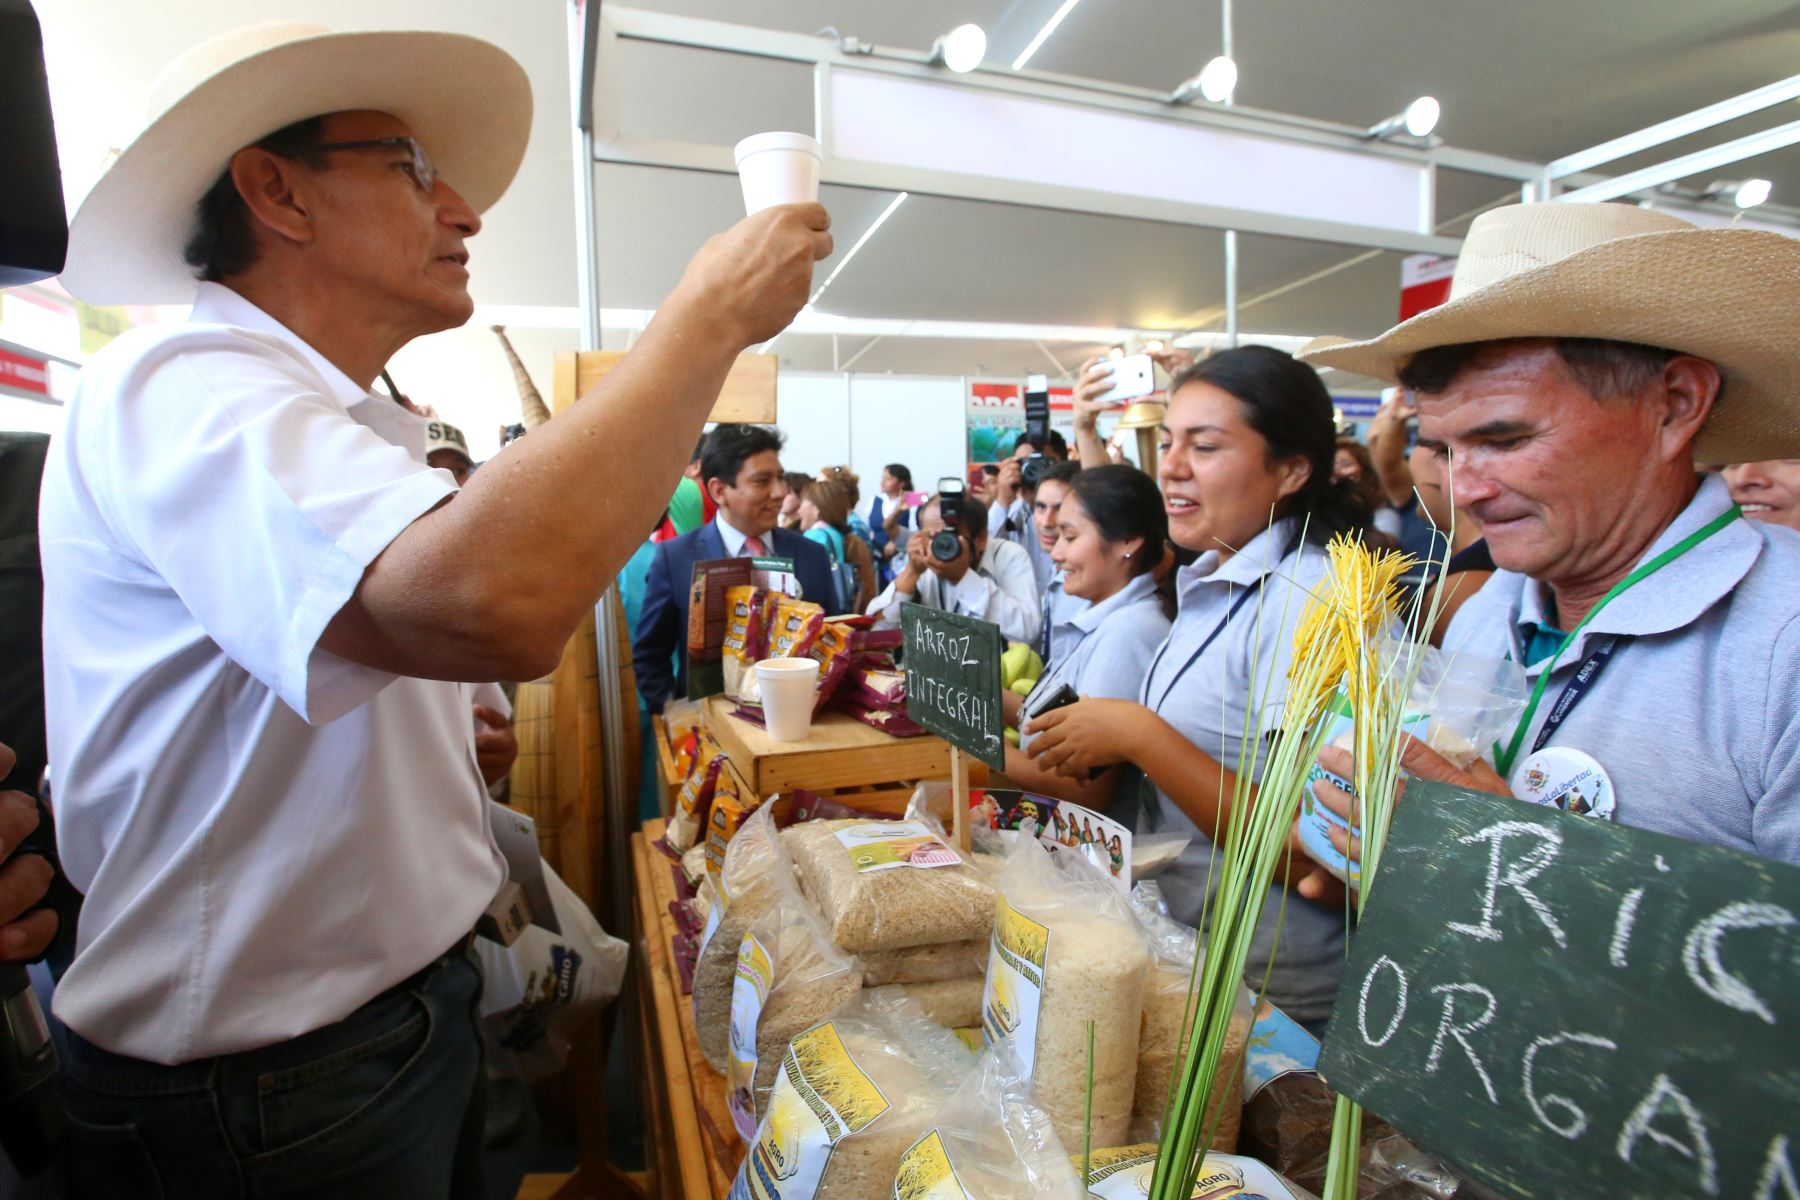 Presidente Vizcarra inaugura Feria Expo Perú Norte 2018. Foto: ANDINA/Prensa Presidencia